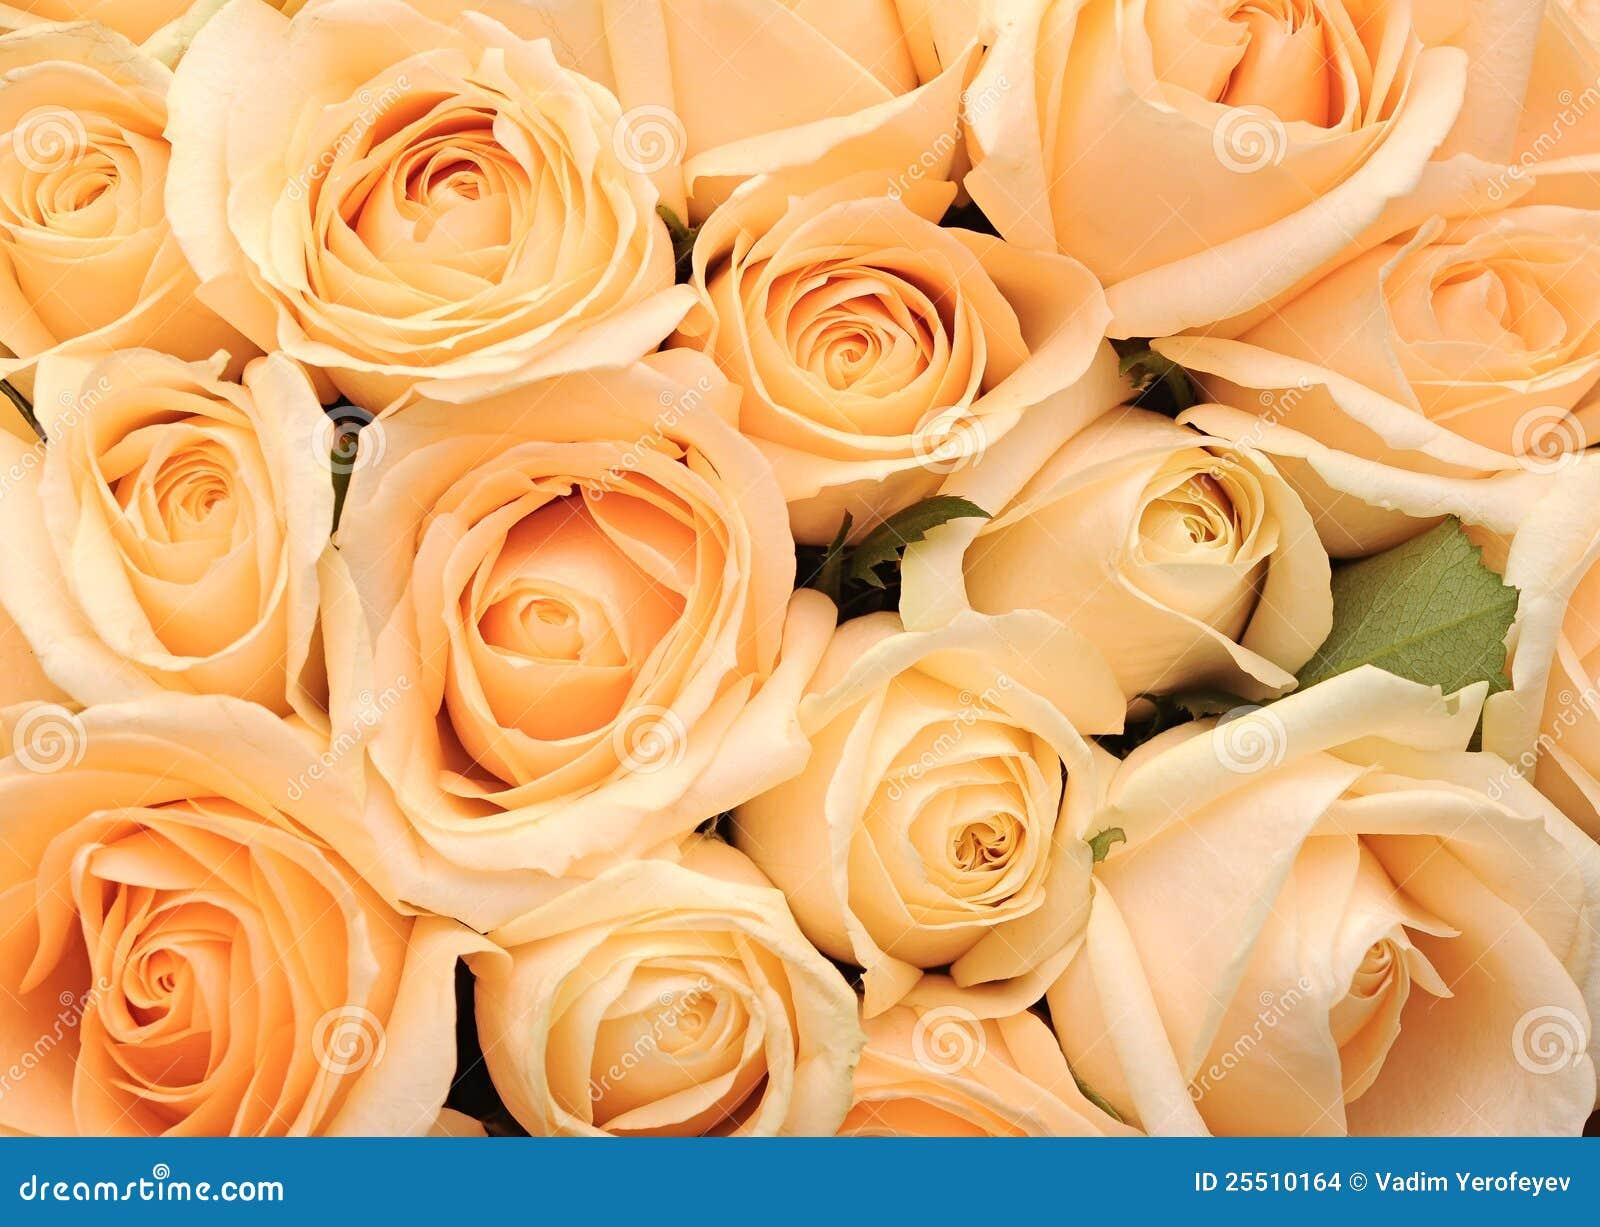 Cream Roses Background Stock Images Image 25510164